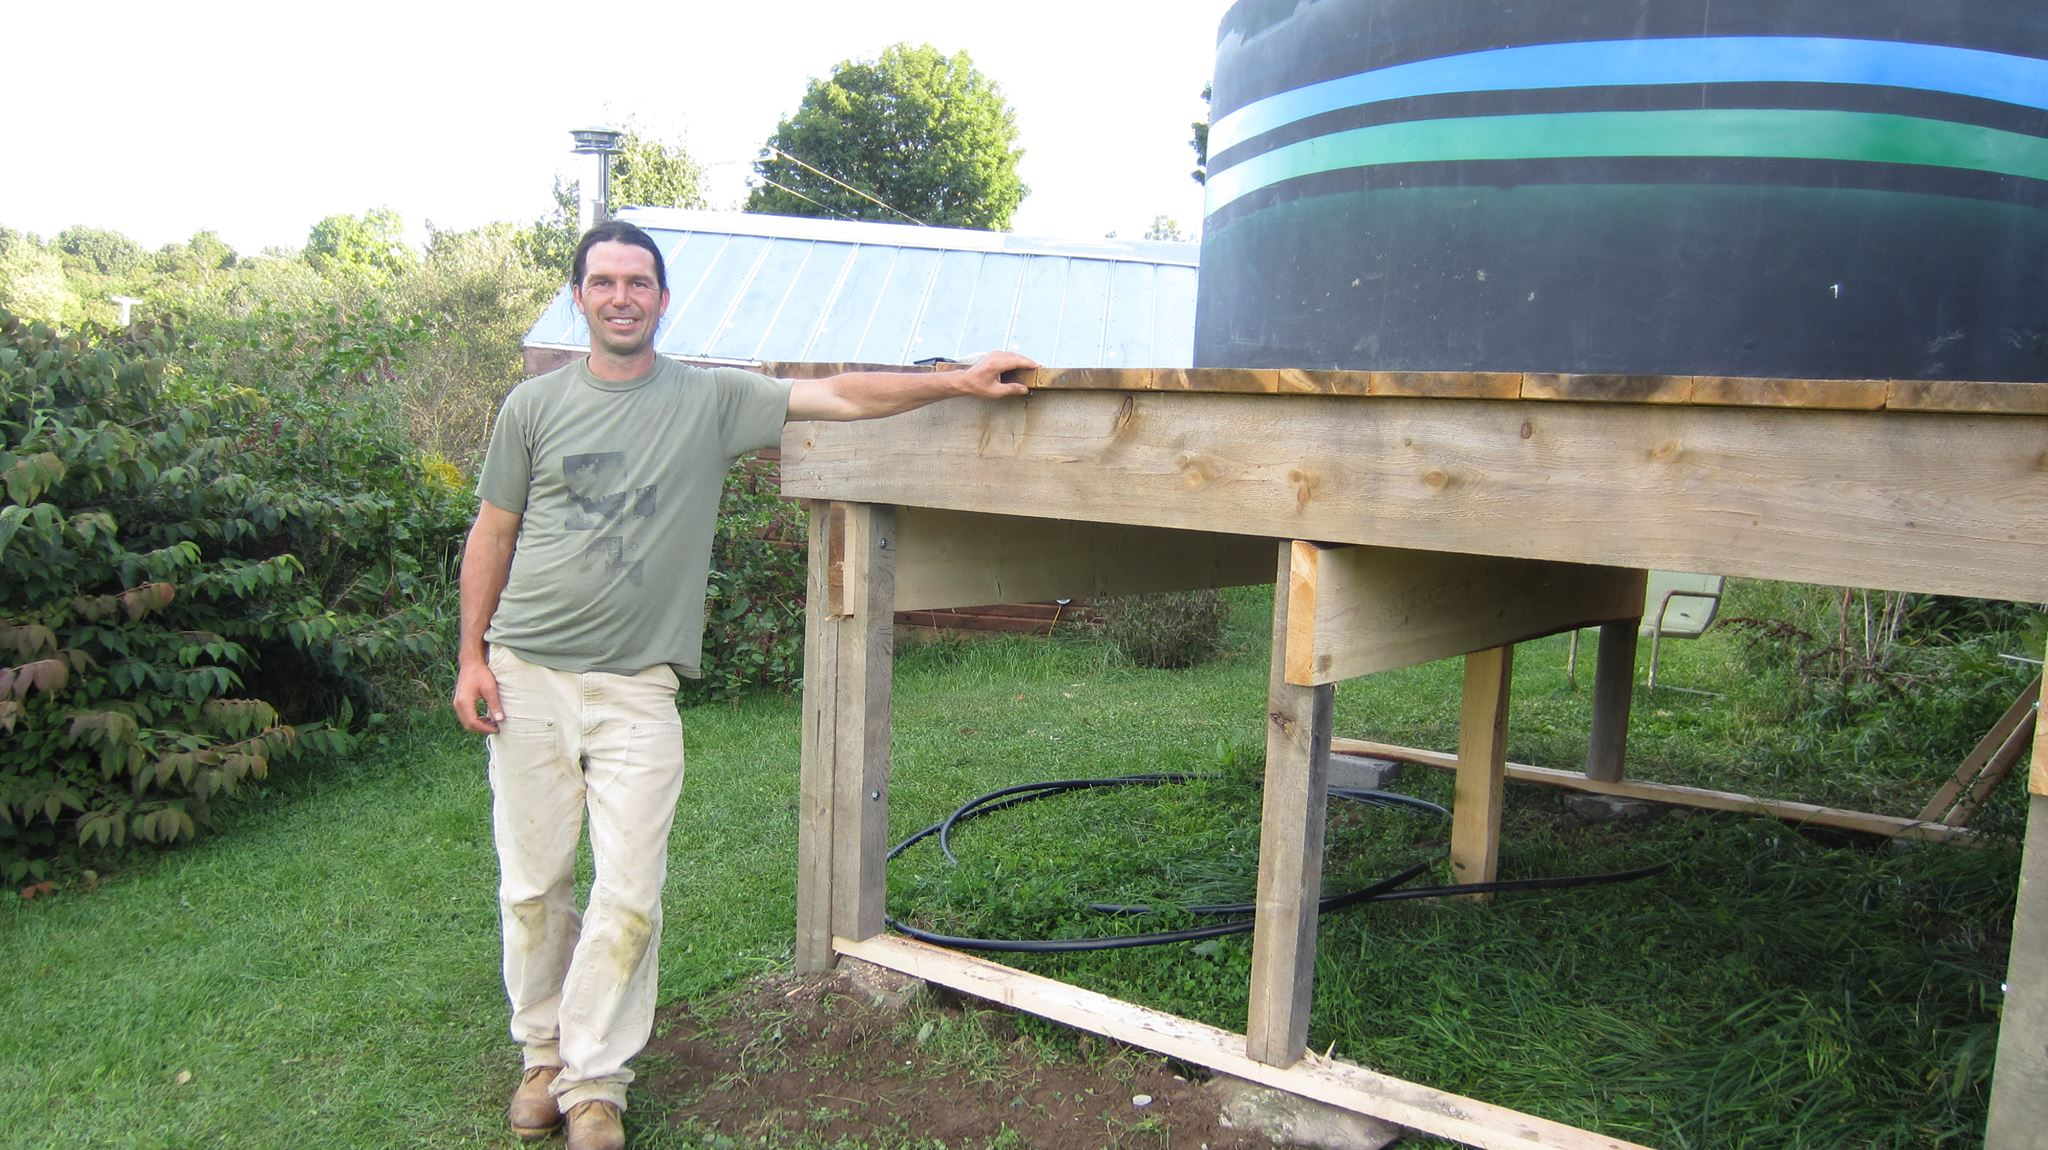 1500 gallon rain tank